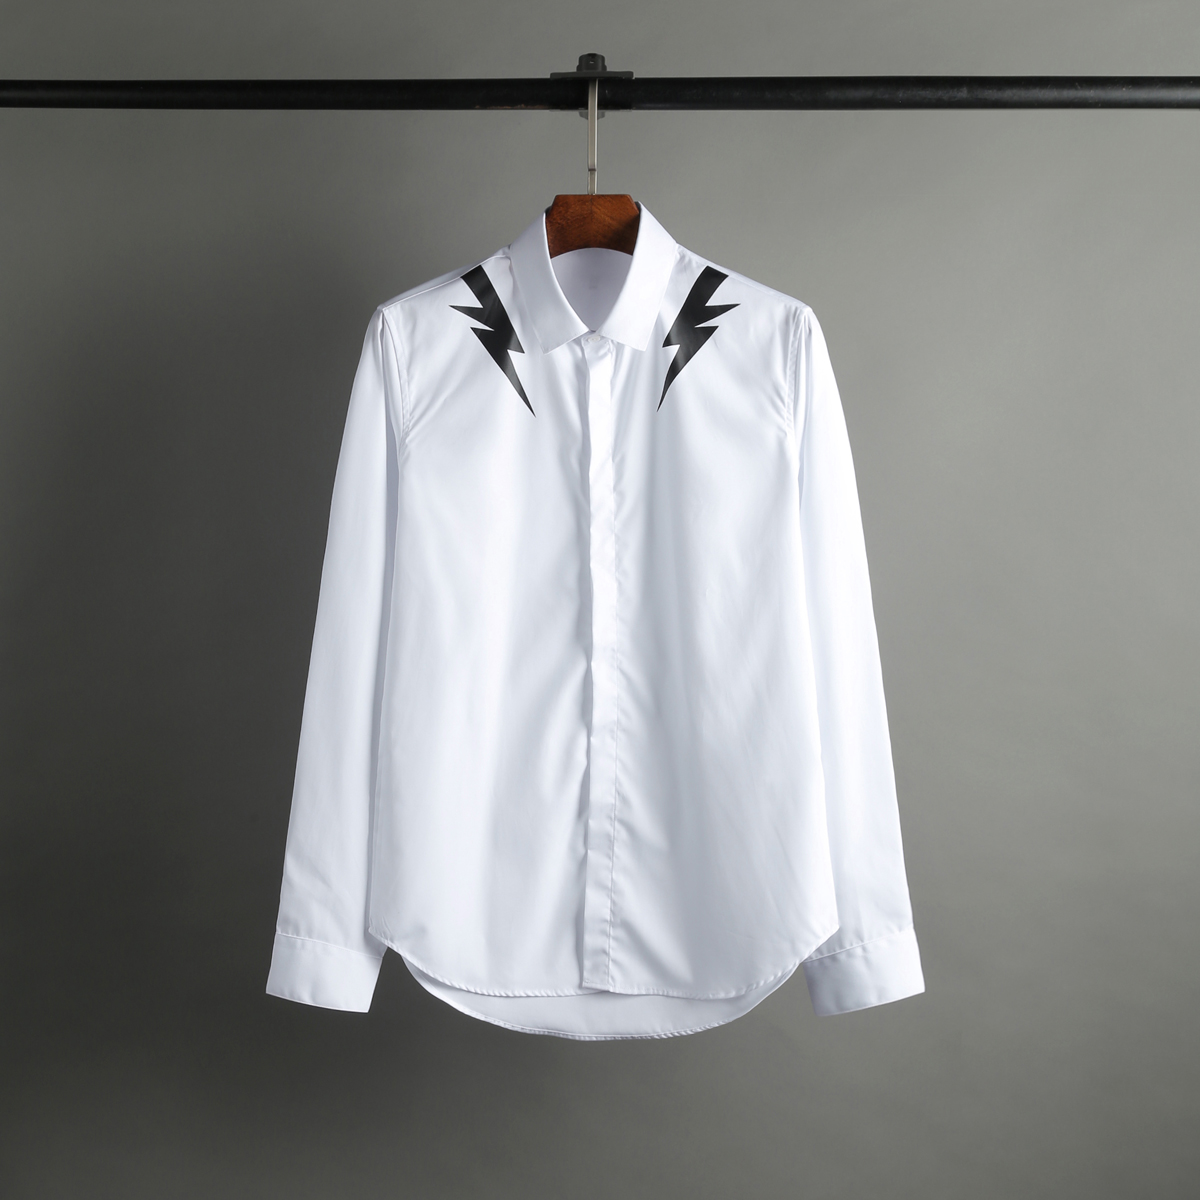 2017 spring summer new lightning collar shoulder print fashion font b shirt b font male catwalk